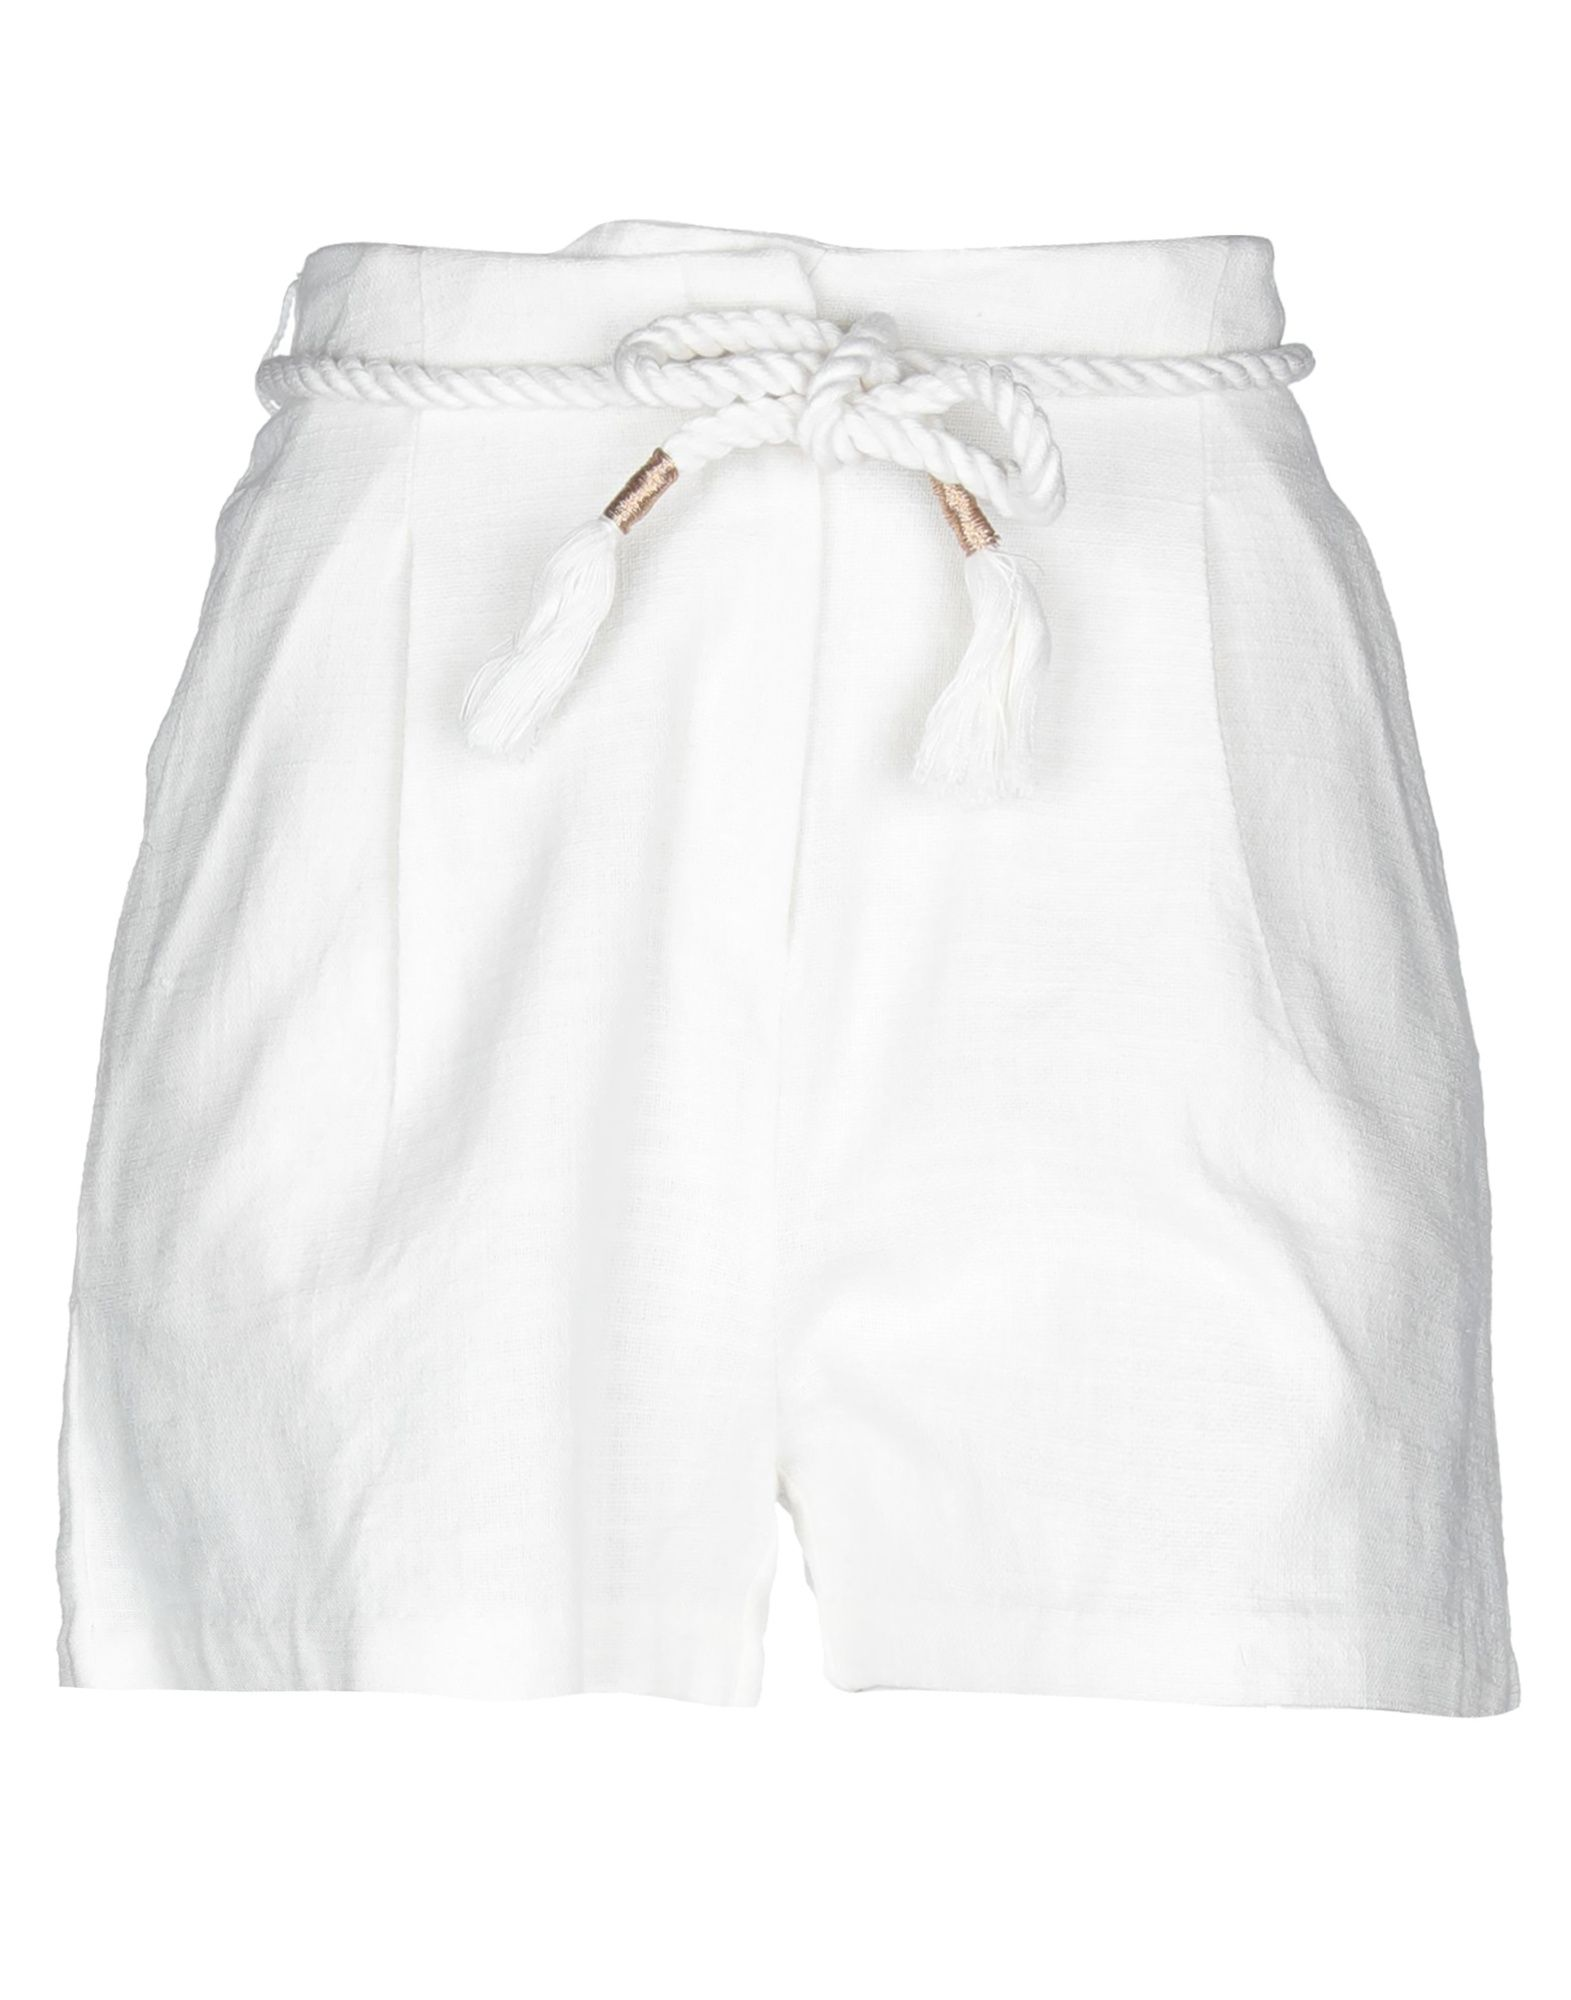 Shorts & Bermuda Antik Batik donna - 13291578AN 13291578AN 13291578AN a95